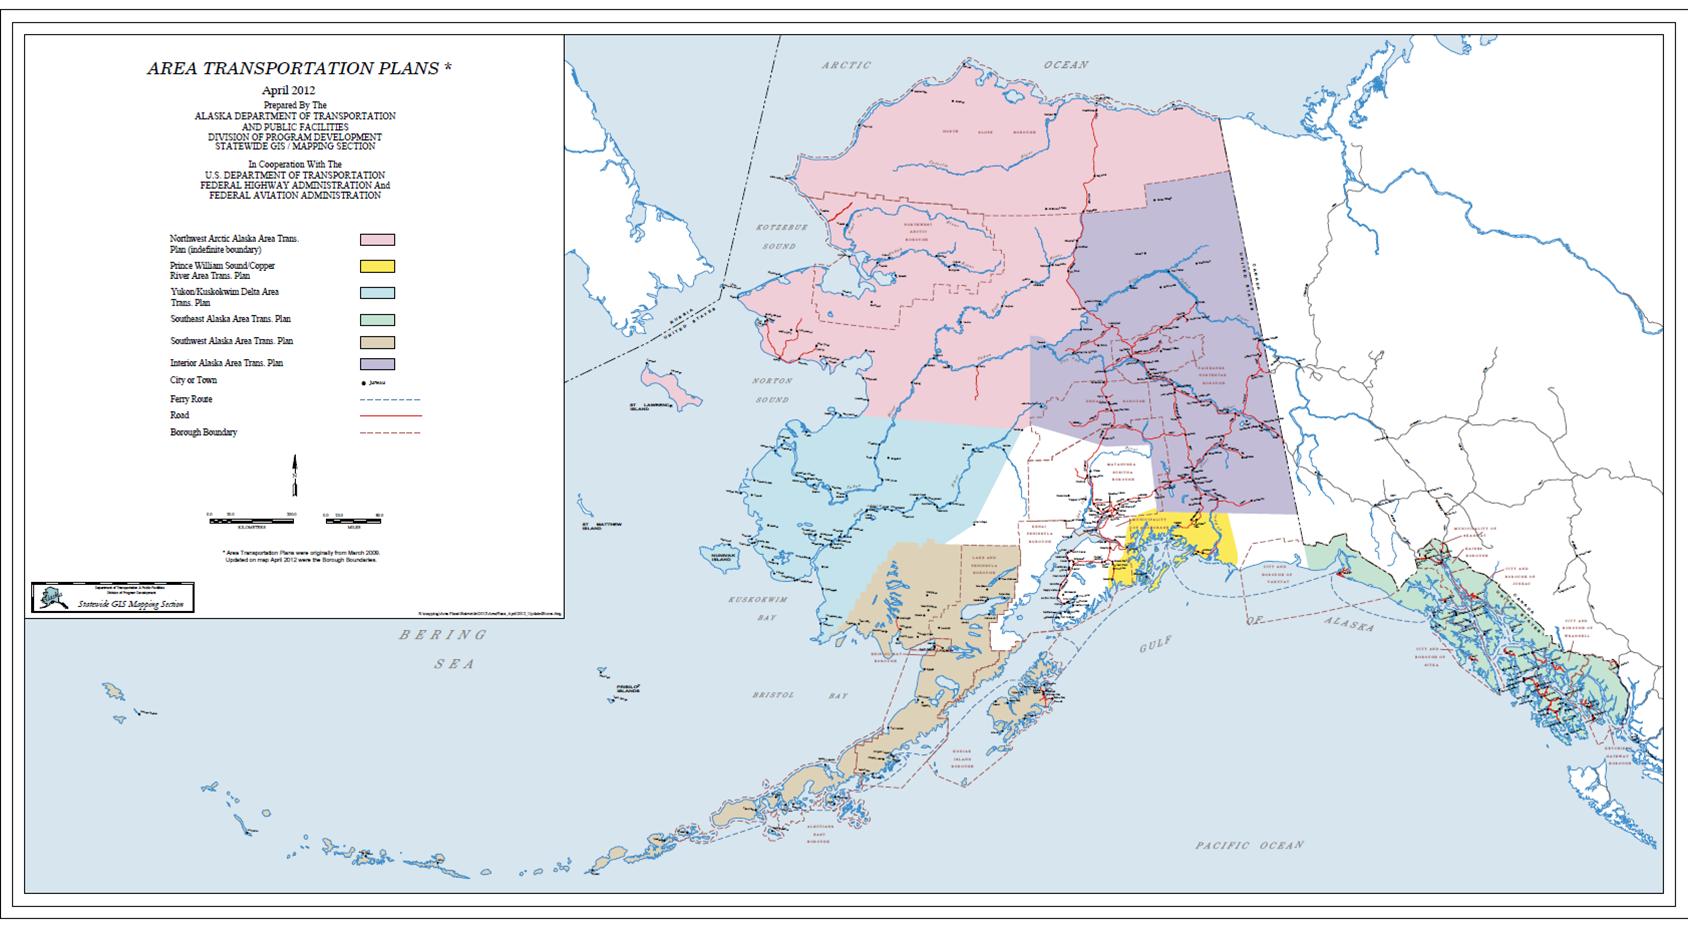 Area Map, Statewide Long Range Transportation Plans, Transportation Yukon Alaska Map on yukon mountains map, yukon territory map, yukon kuskokwim map, yukon miner, yukon map klondike, yukon alaska real estate, yukon juneau map, yukon country map, yukon canadian political map, yukon road map, yukon fire map, arctic village ak map, yukon population 2014, whitehorse yukon map, yukon quest map, yukon carmack's dunes, yukon united states map, great bear lake map, yukon canada, yukon tundra map,